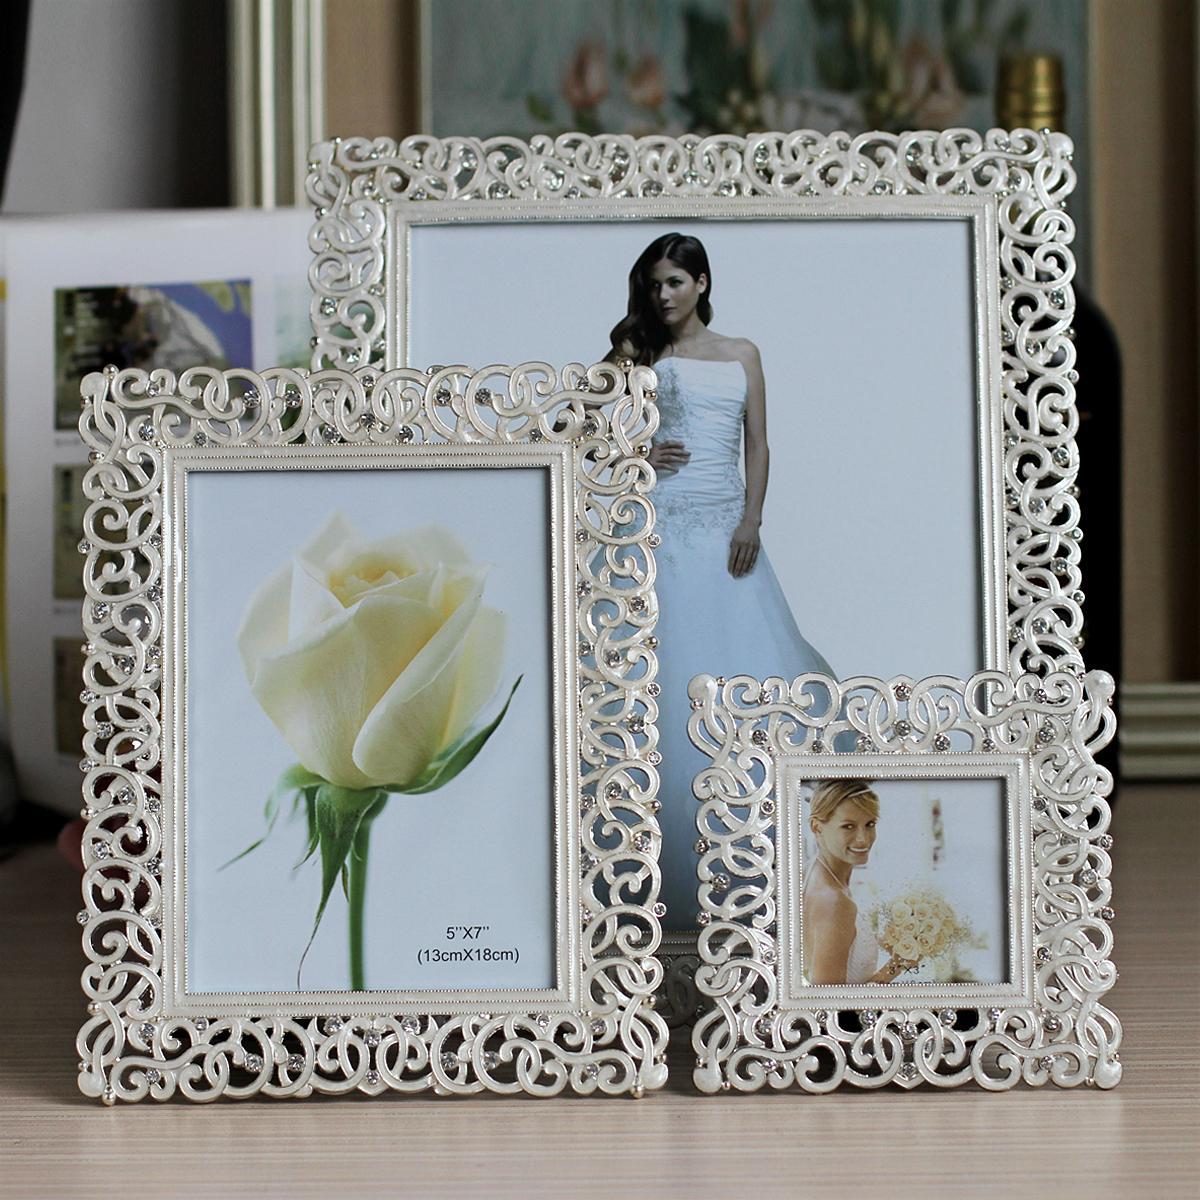 Wedding Gift Photo Frame: 6 Inch Set Auger Creative Photo Frame Marriage Gauze Photo